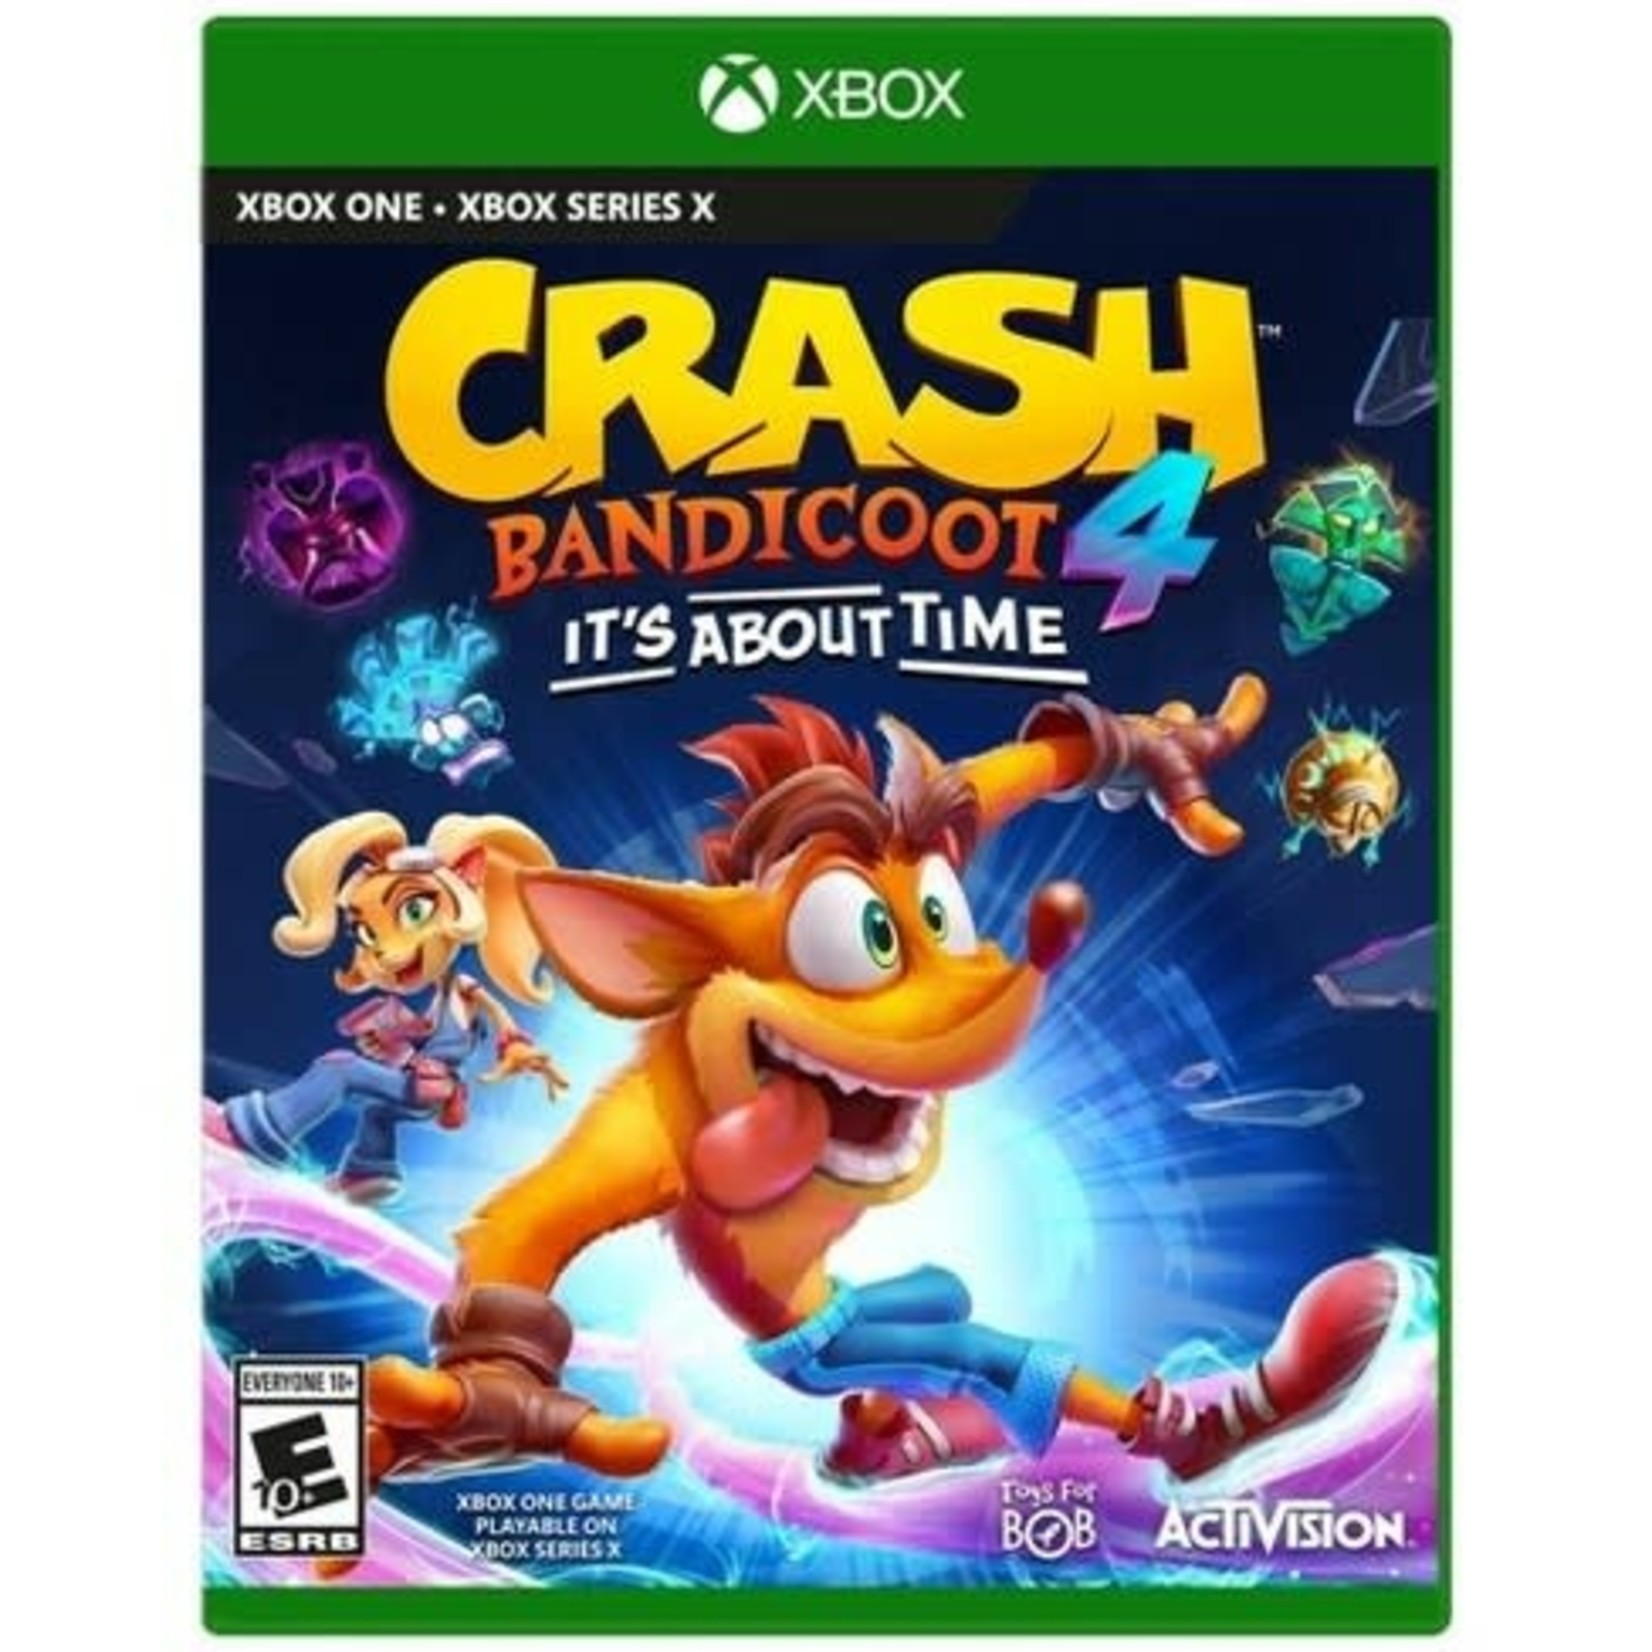 xb1u-Crash Bandicoot 4: It's About Time